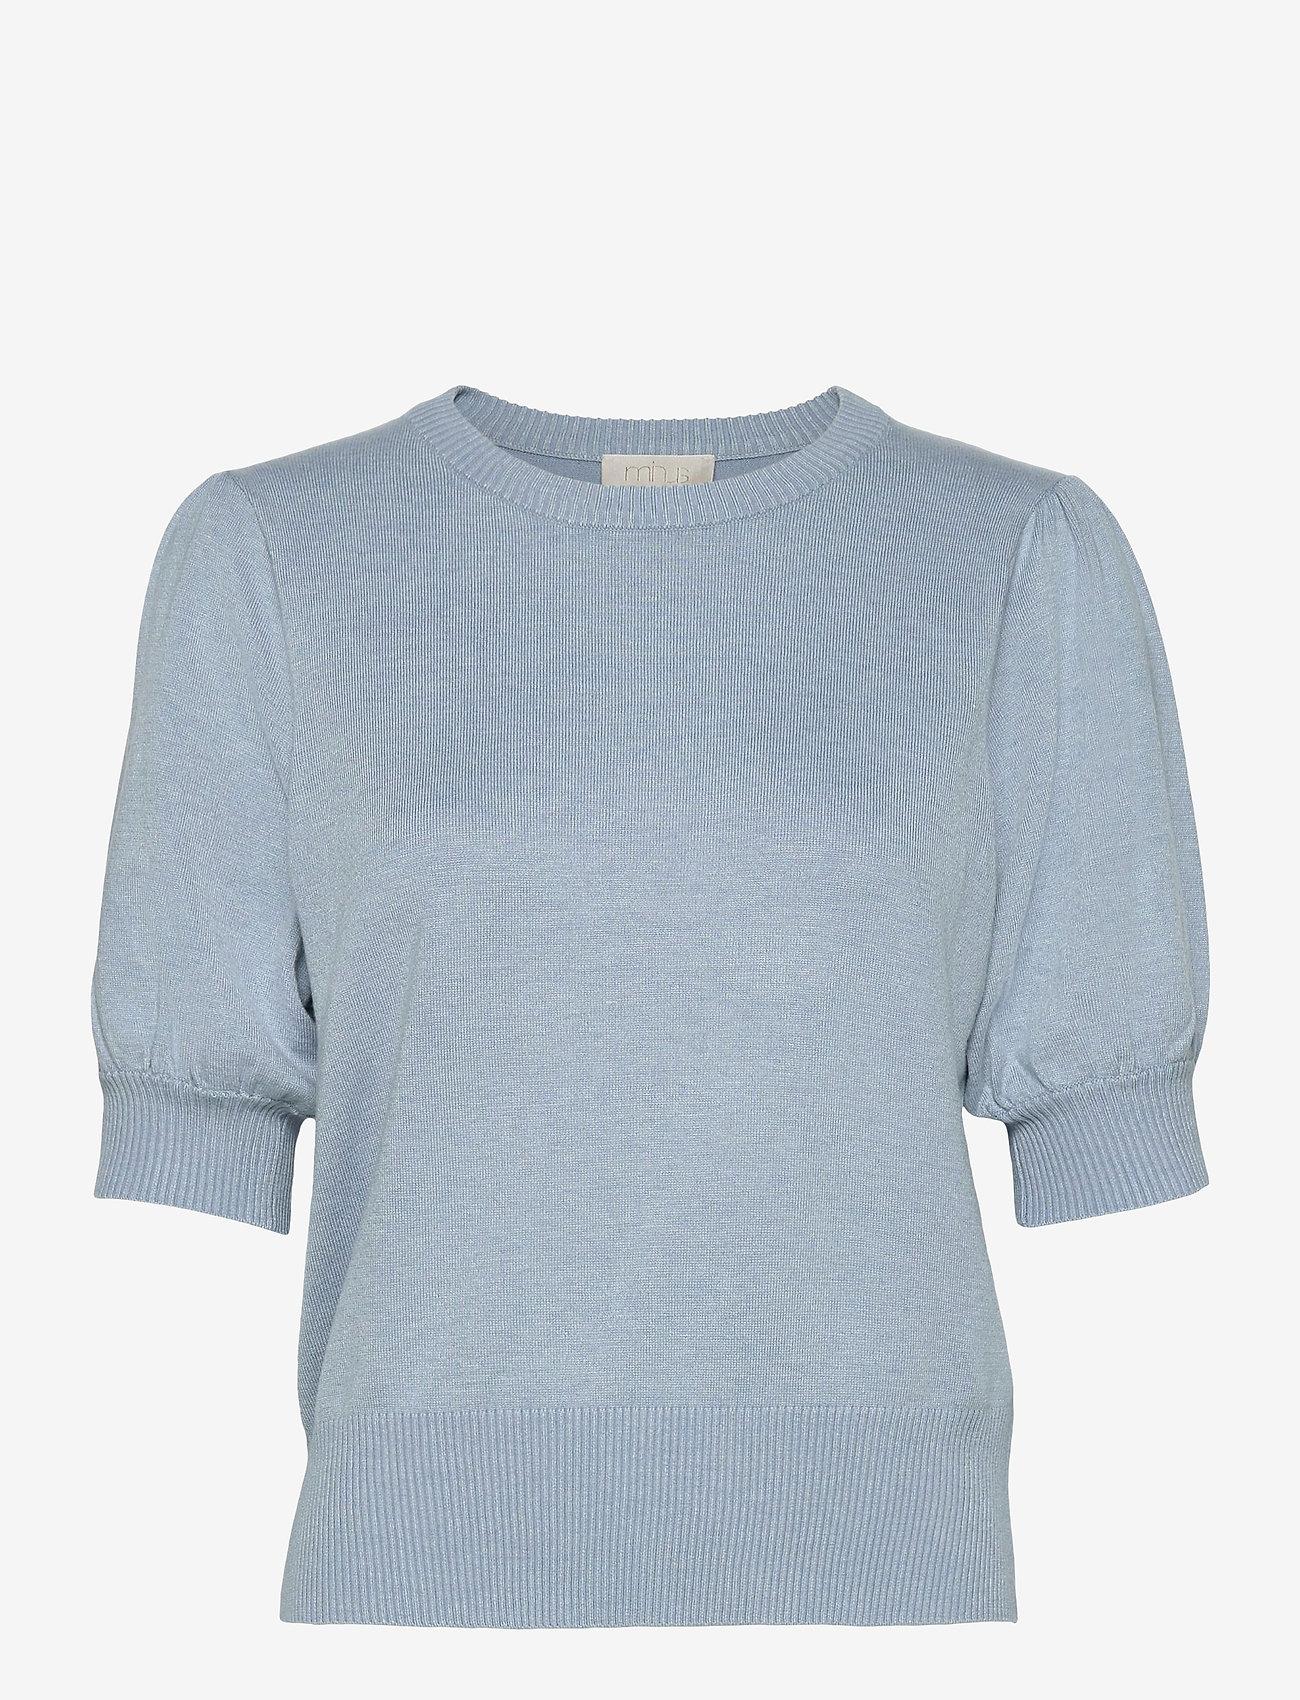 Minus - Liva knit tee - strikkede toppe - dusty blue melange - 0